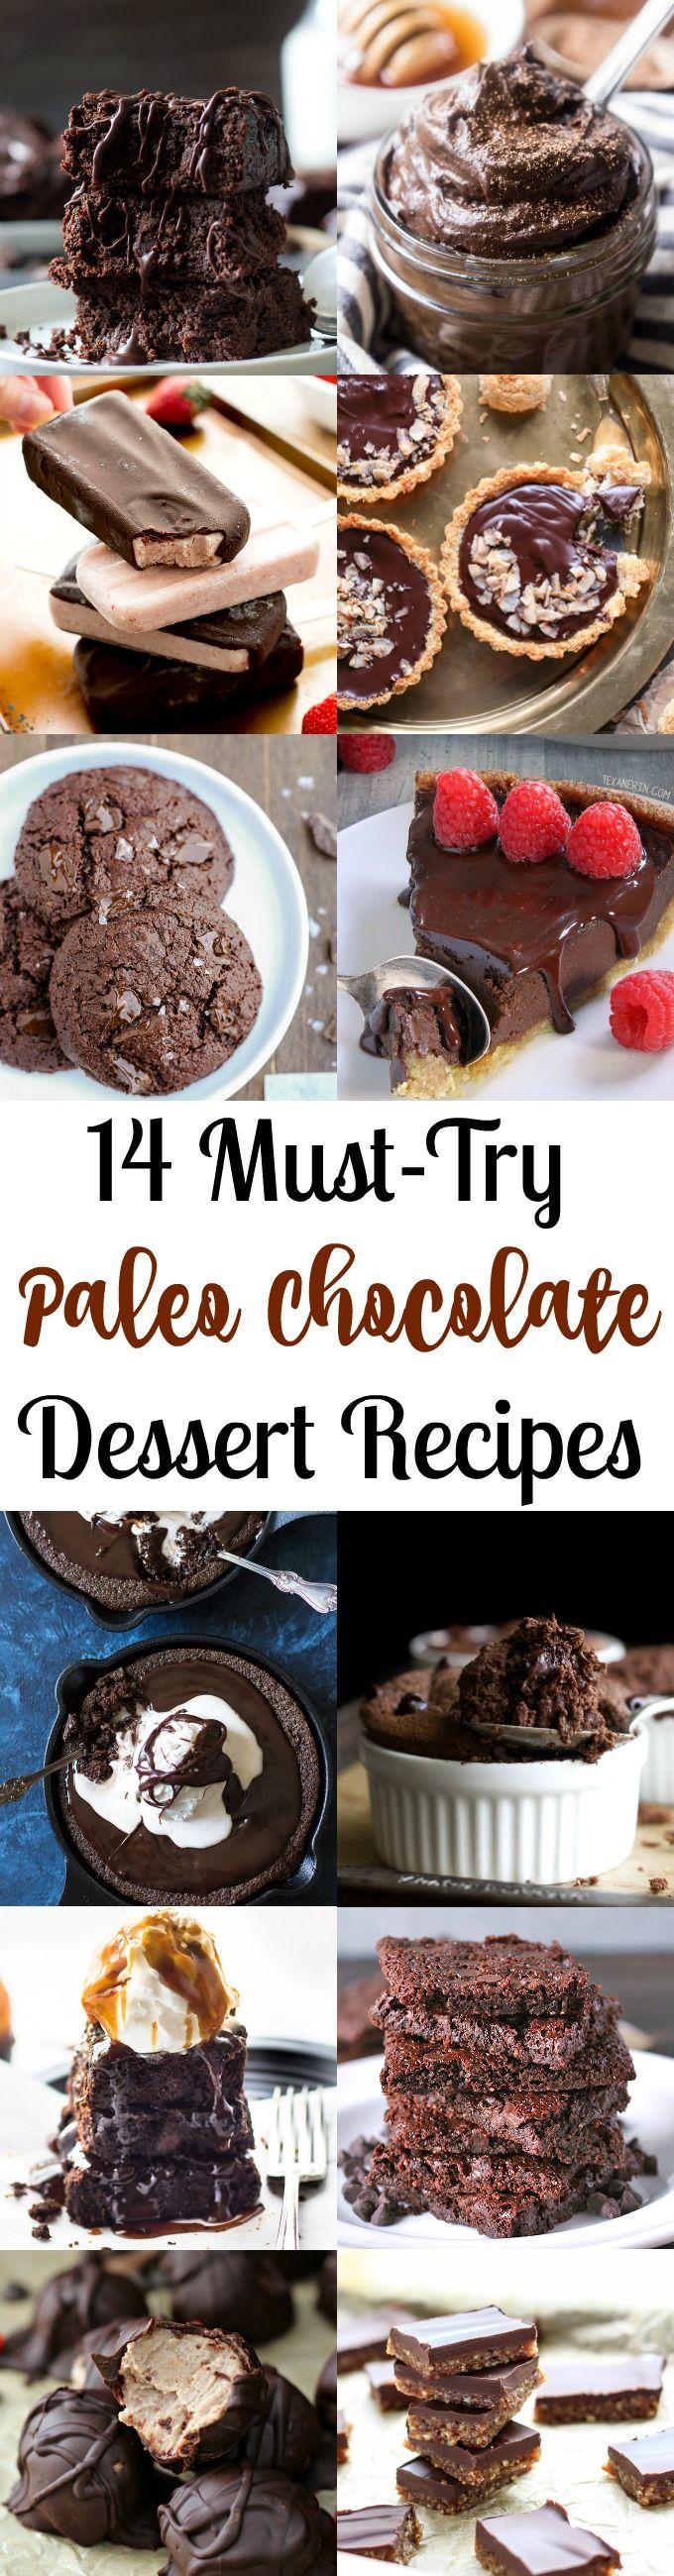 14 Must-Try Paleo Chocolate Dessert Recipes